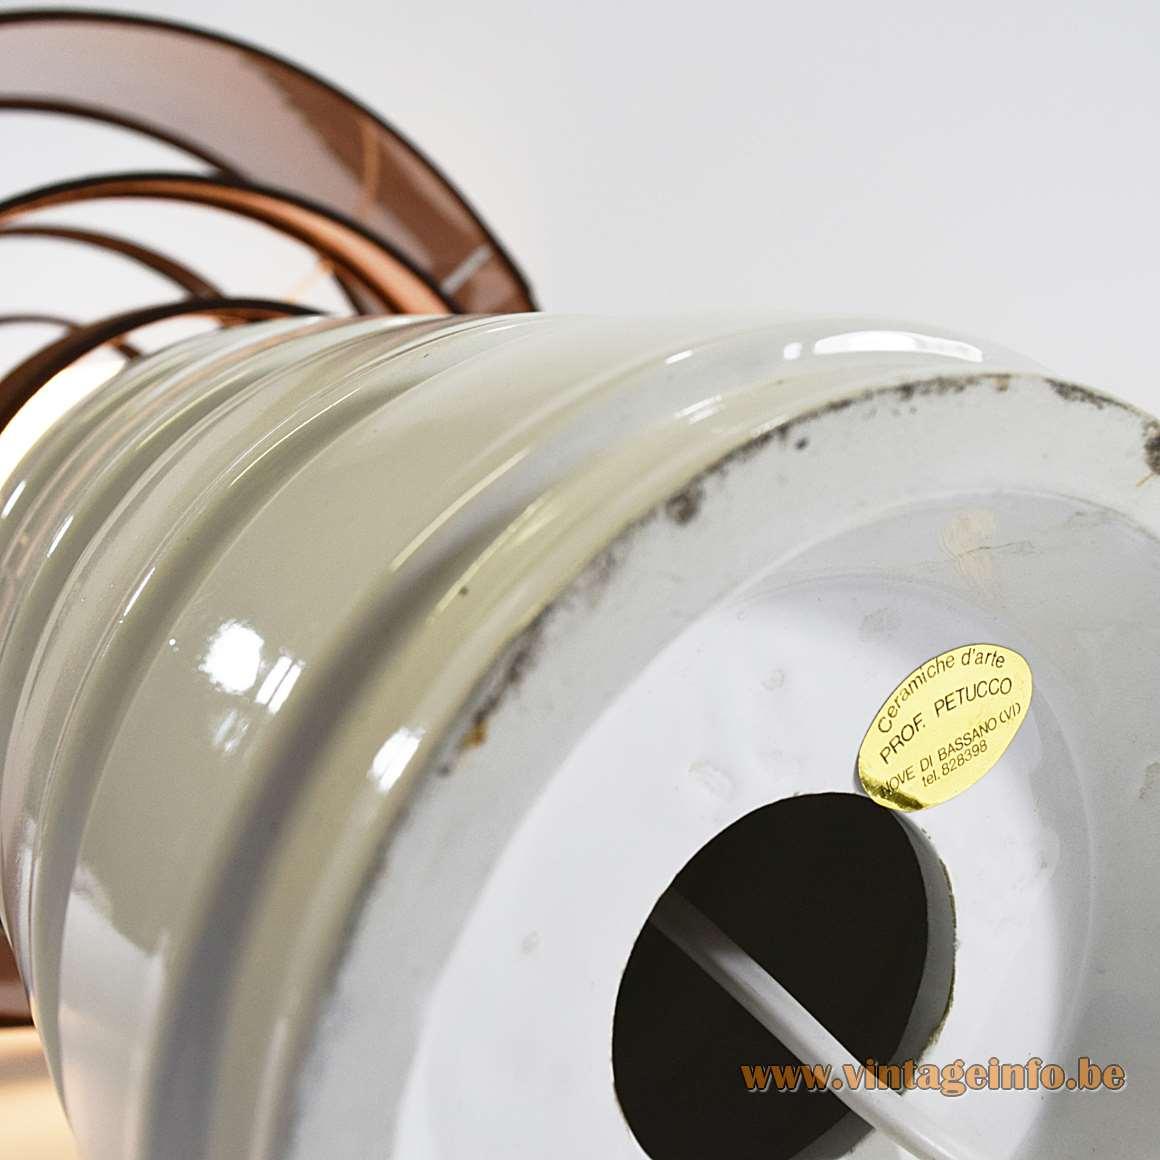 Prof. Petucco Table Lamp - label